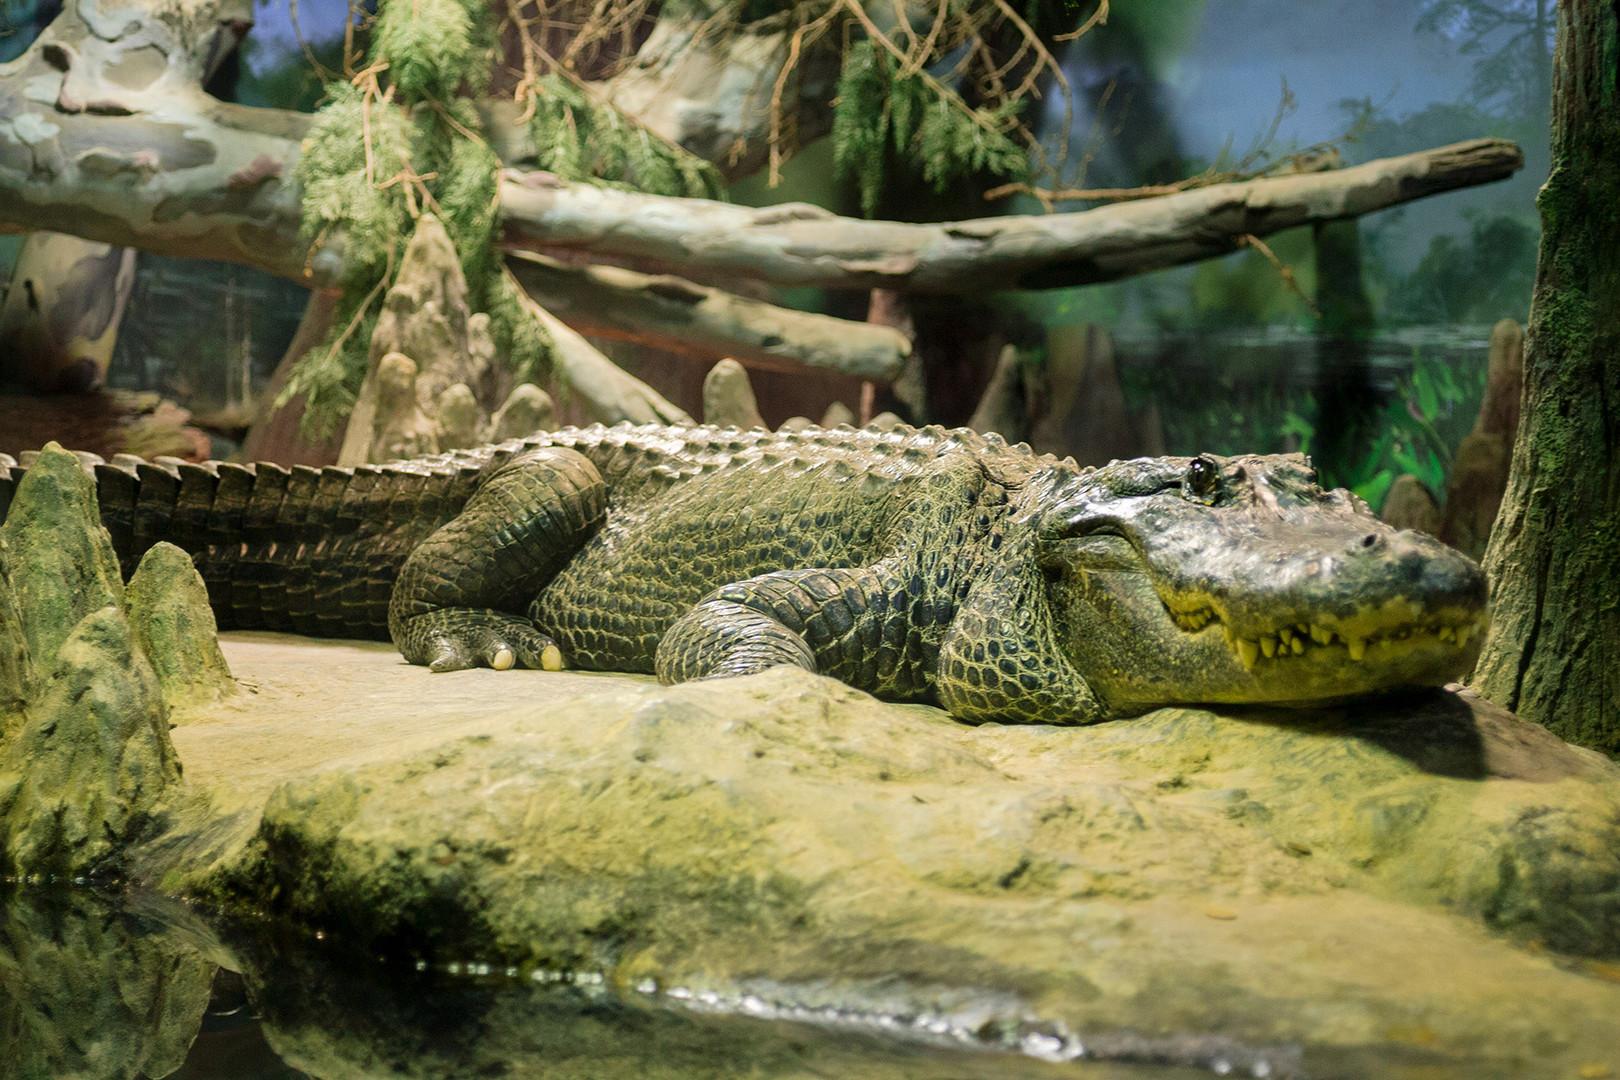 Saturn alligator.